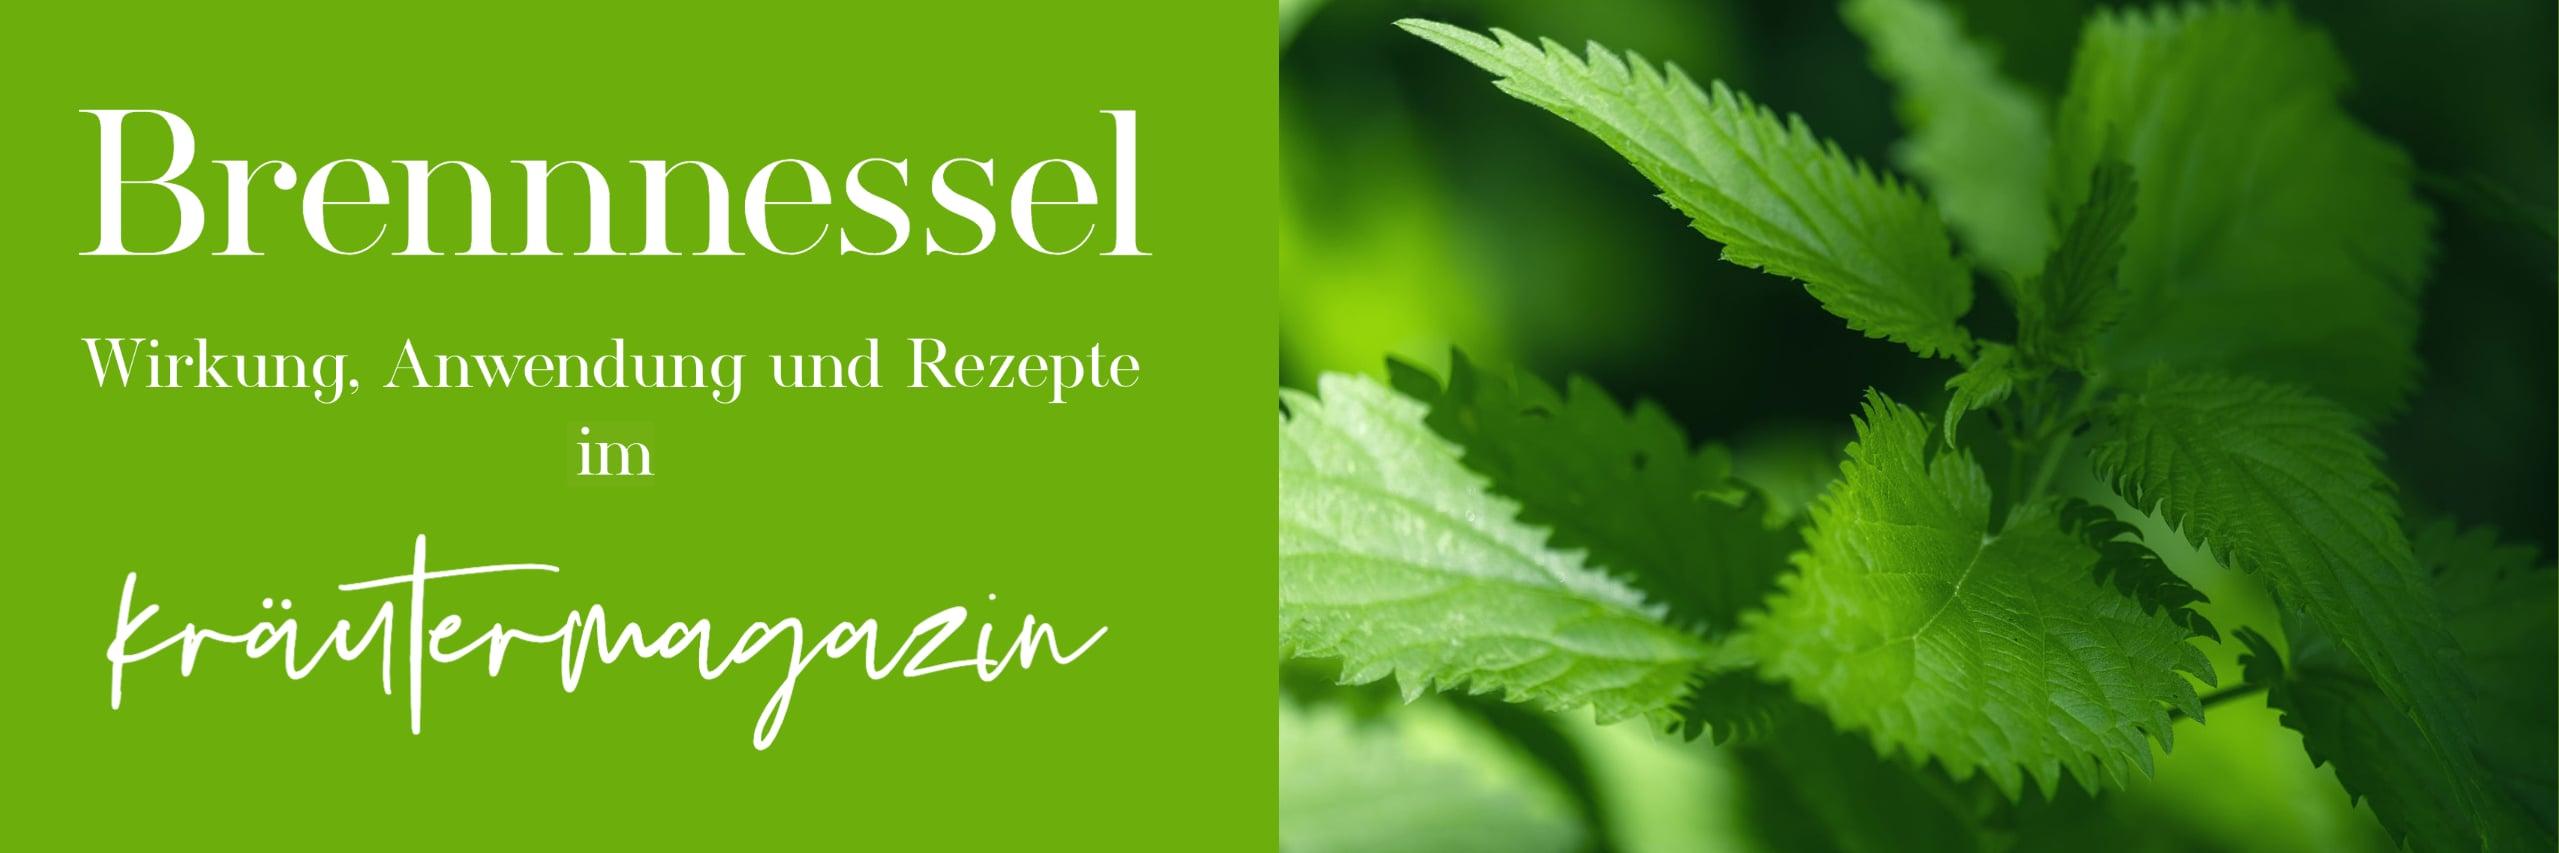 Magazin-Brennnessel-Banner-Copy